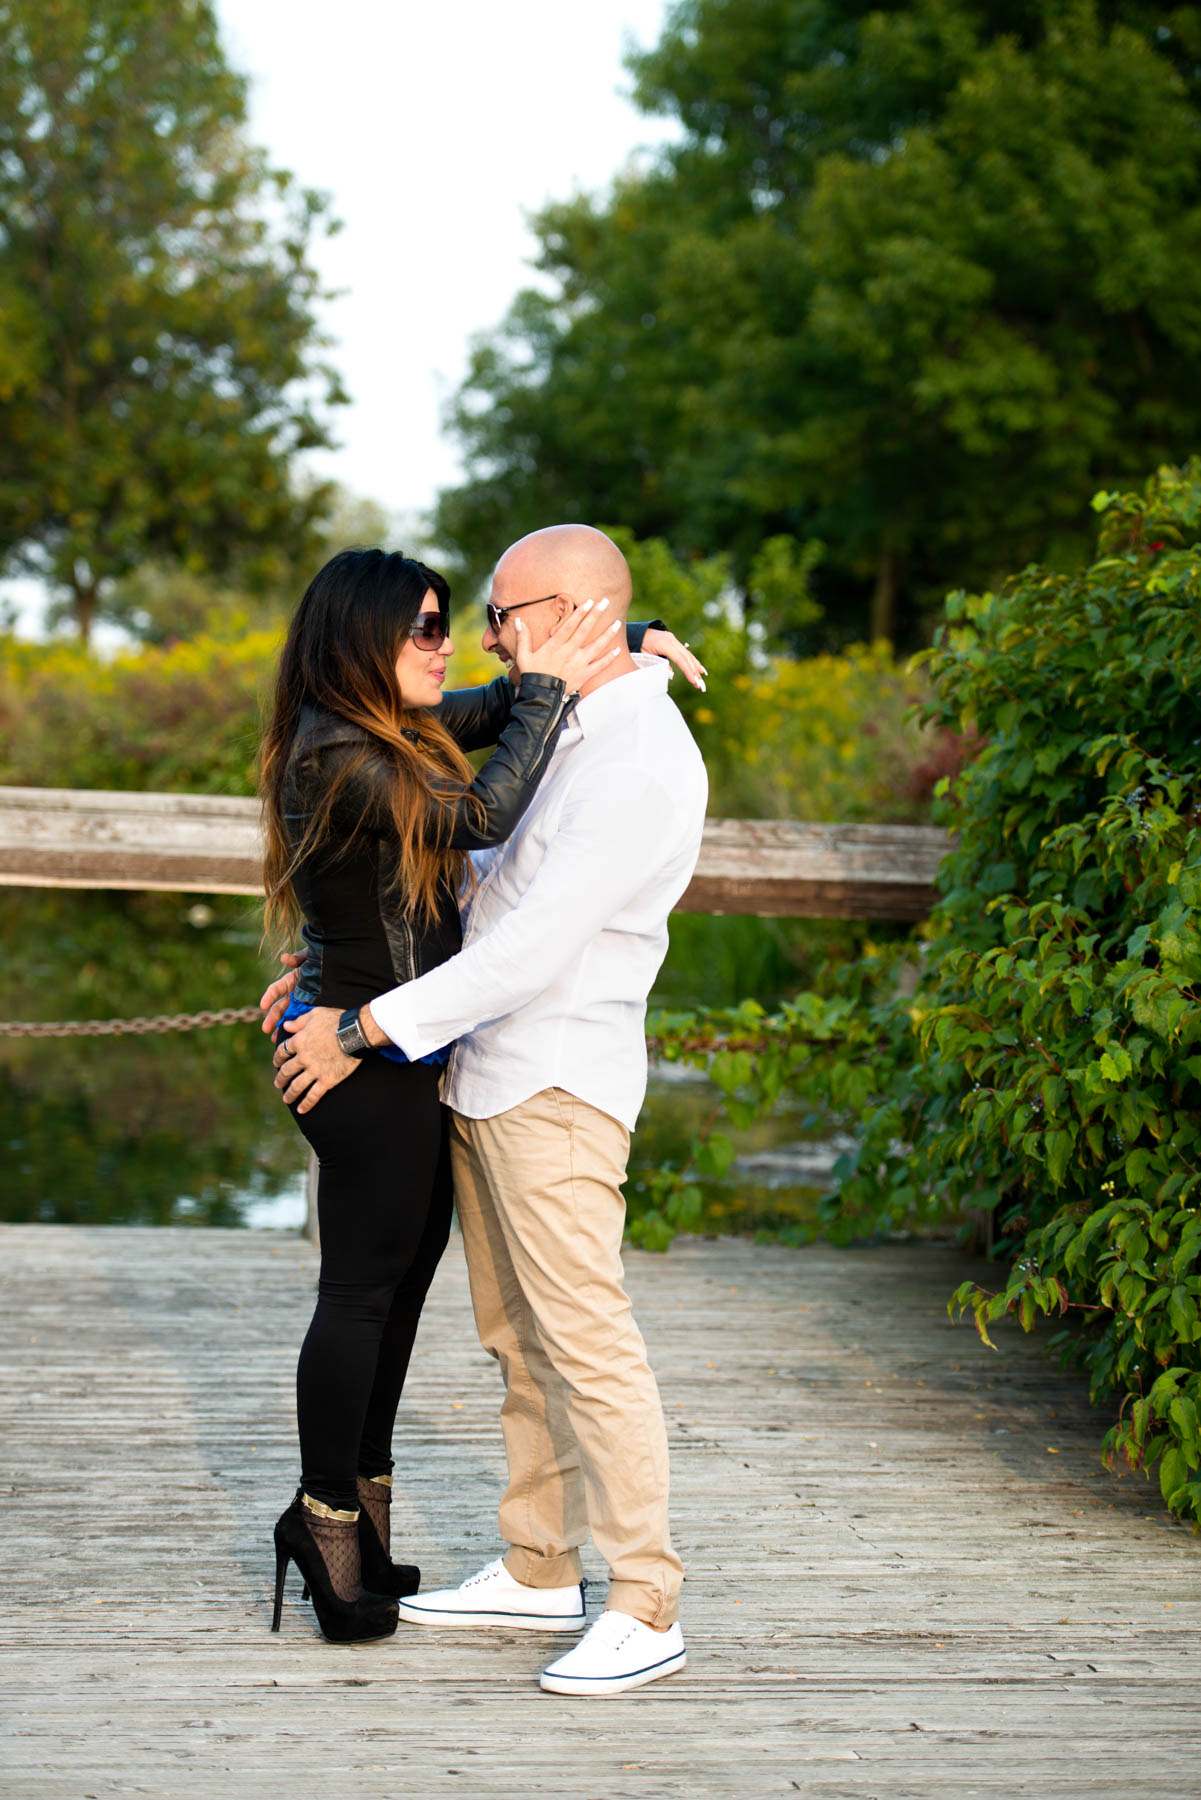 035 - Engagement FL Humber Bay Park - Toronto